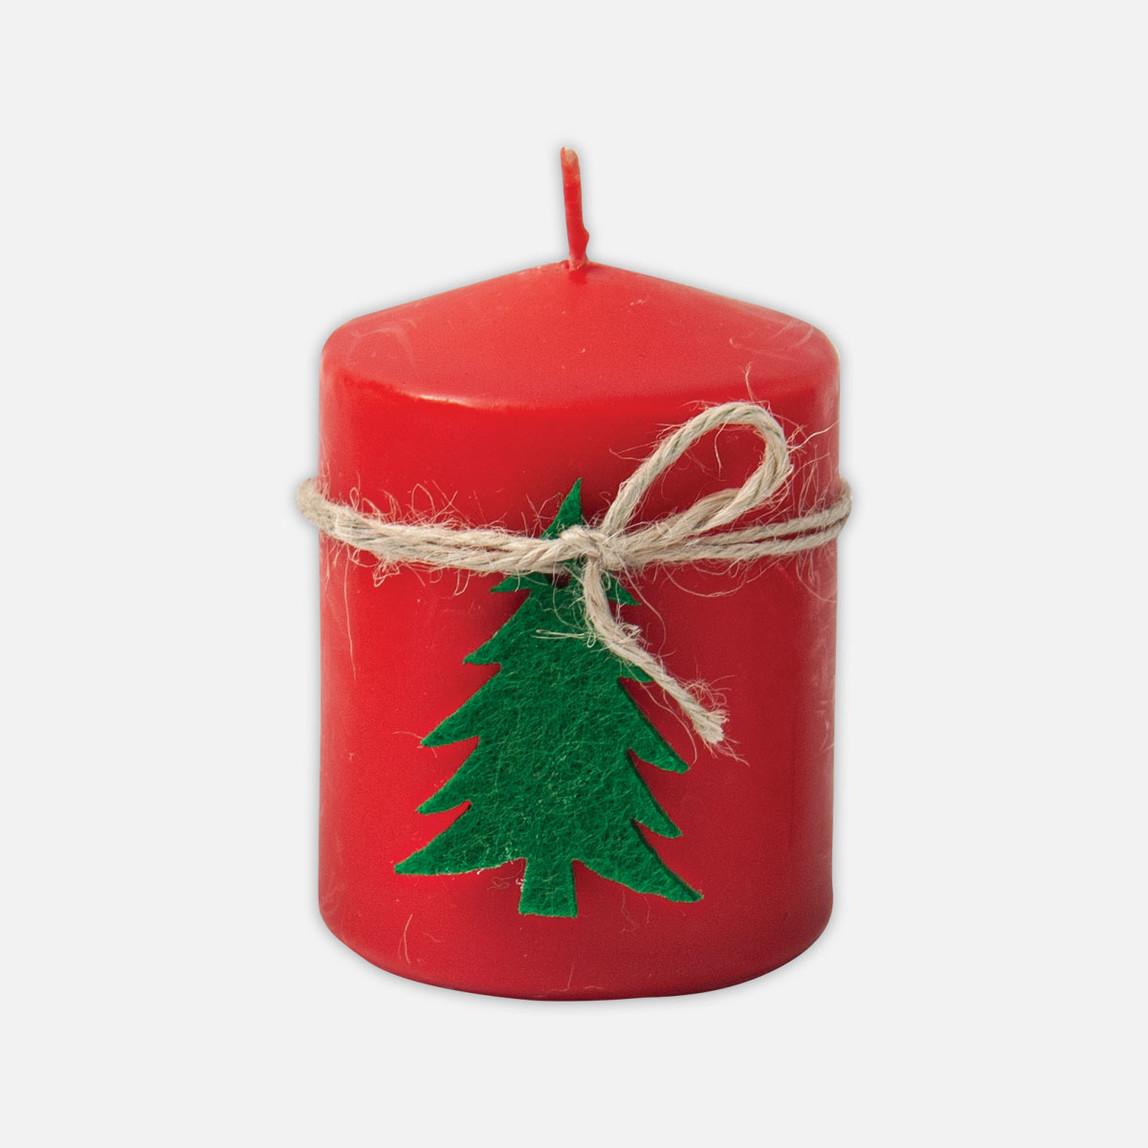 Çam Ağaçlı Kırmızı Mum